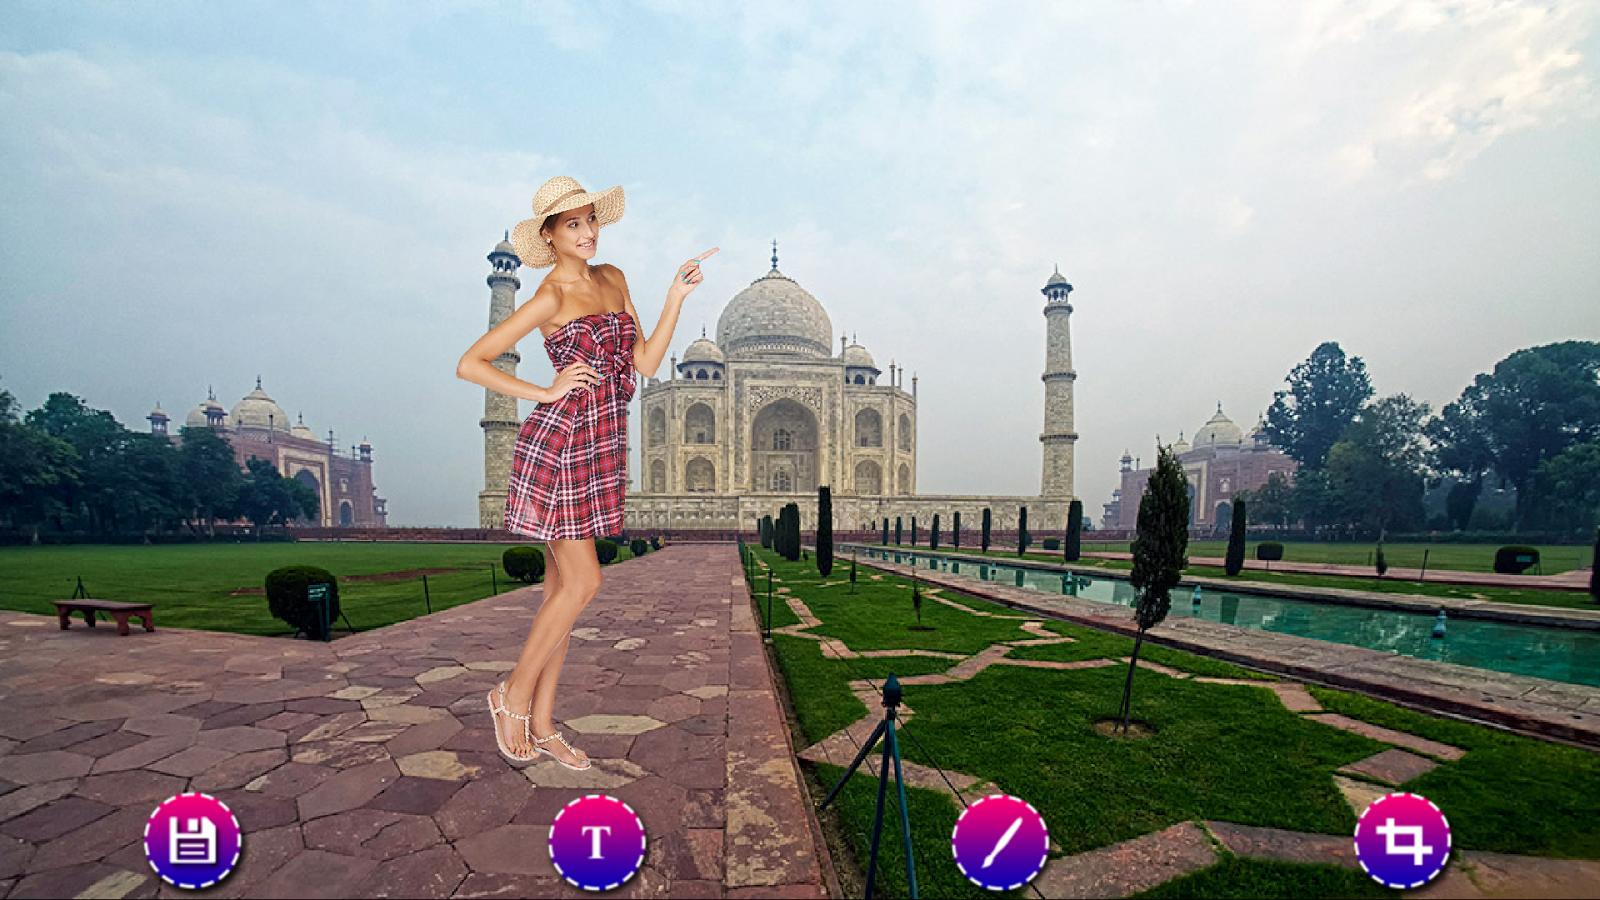 Wallpaper download karne ka app - Photo Backgrounds Screenshot